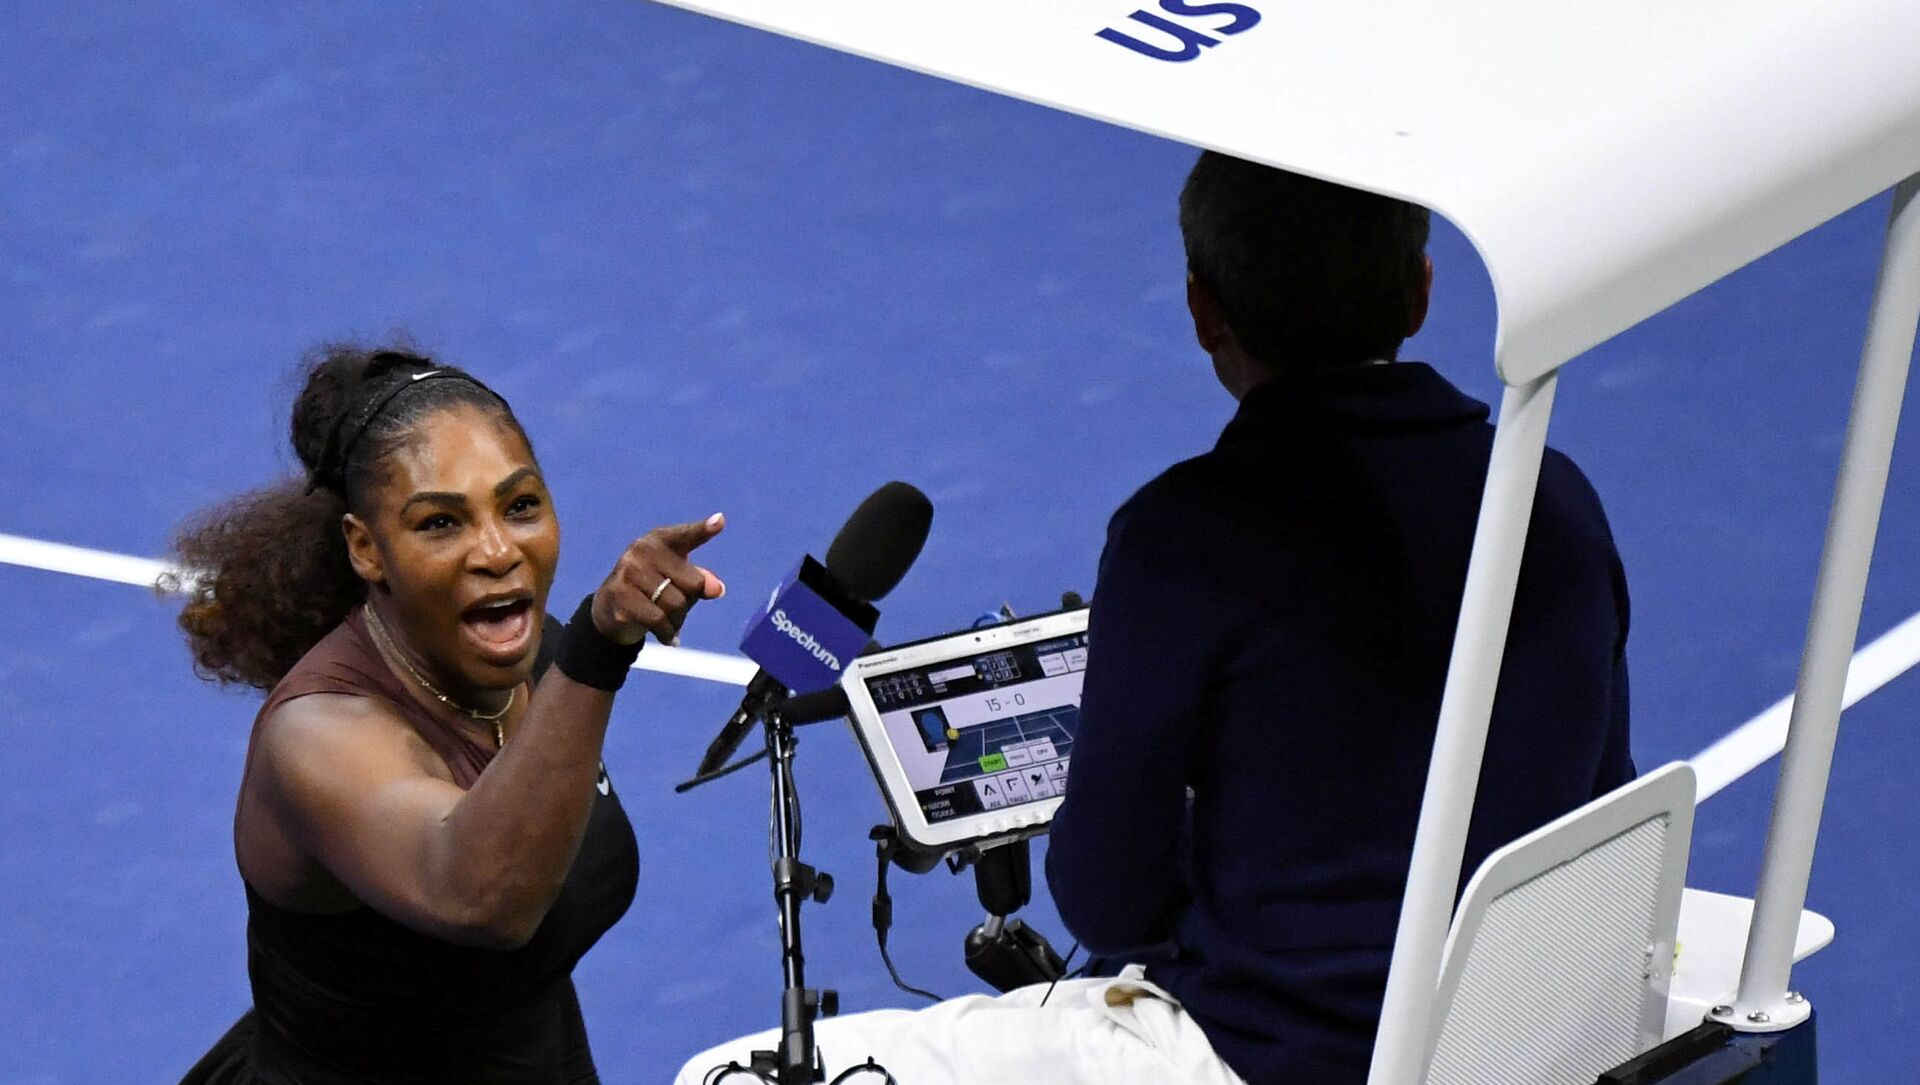 Serena Williams - Sputnik Türkiye, 1920, 08.03.2021